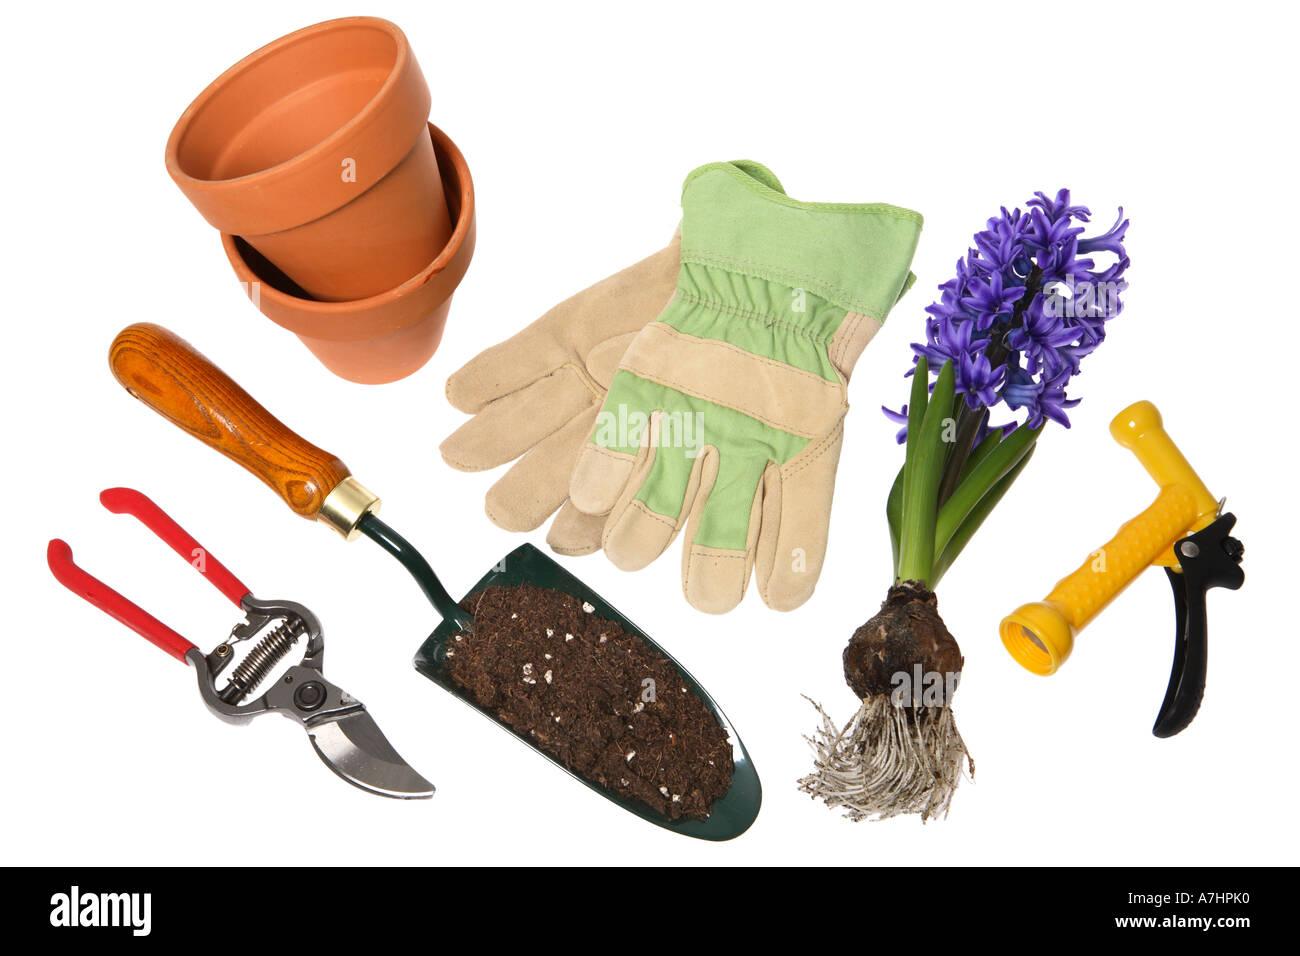 Gardening objects: Pruning shears, shovel with potting soil, terra cotta pots, gardening gloves, Hyacinth bulbs - Stock Image